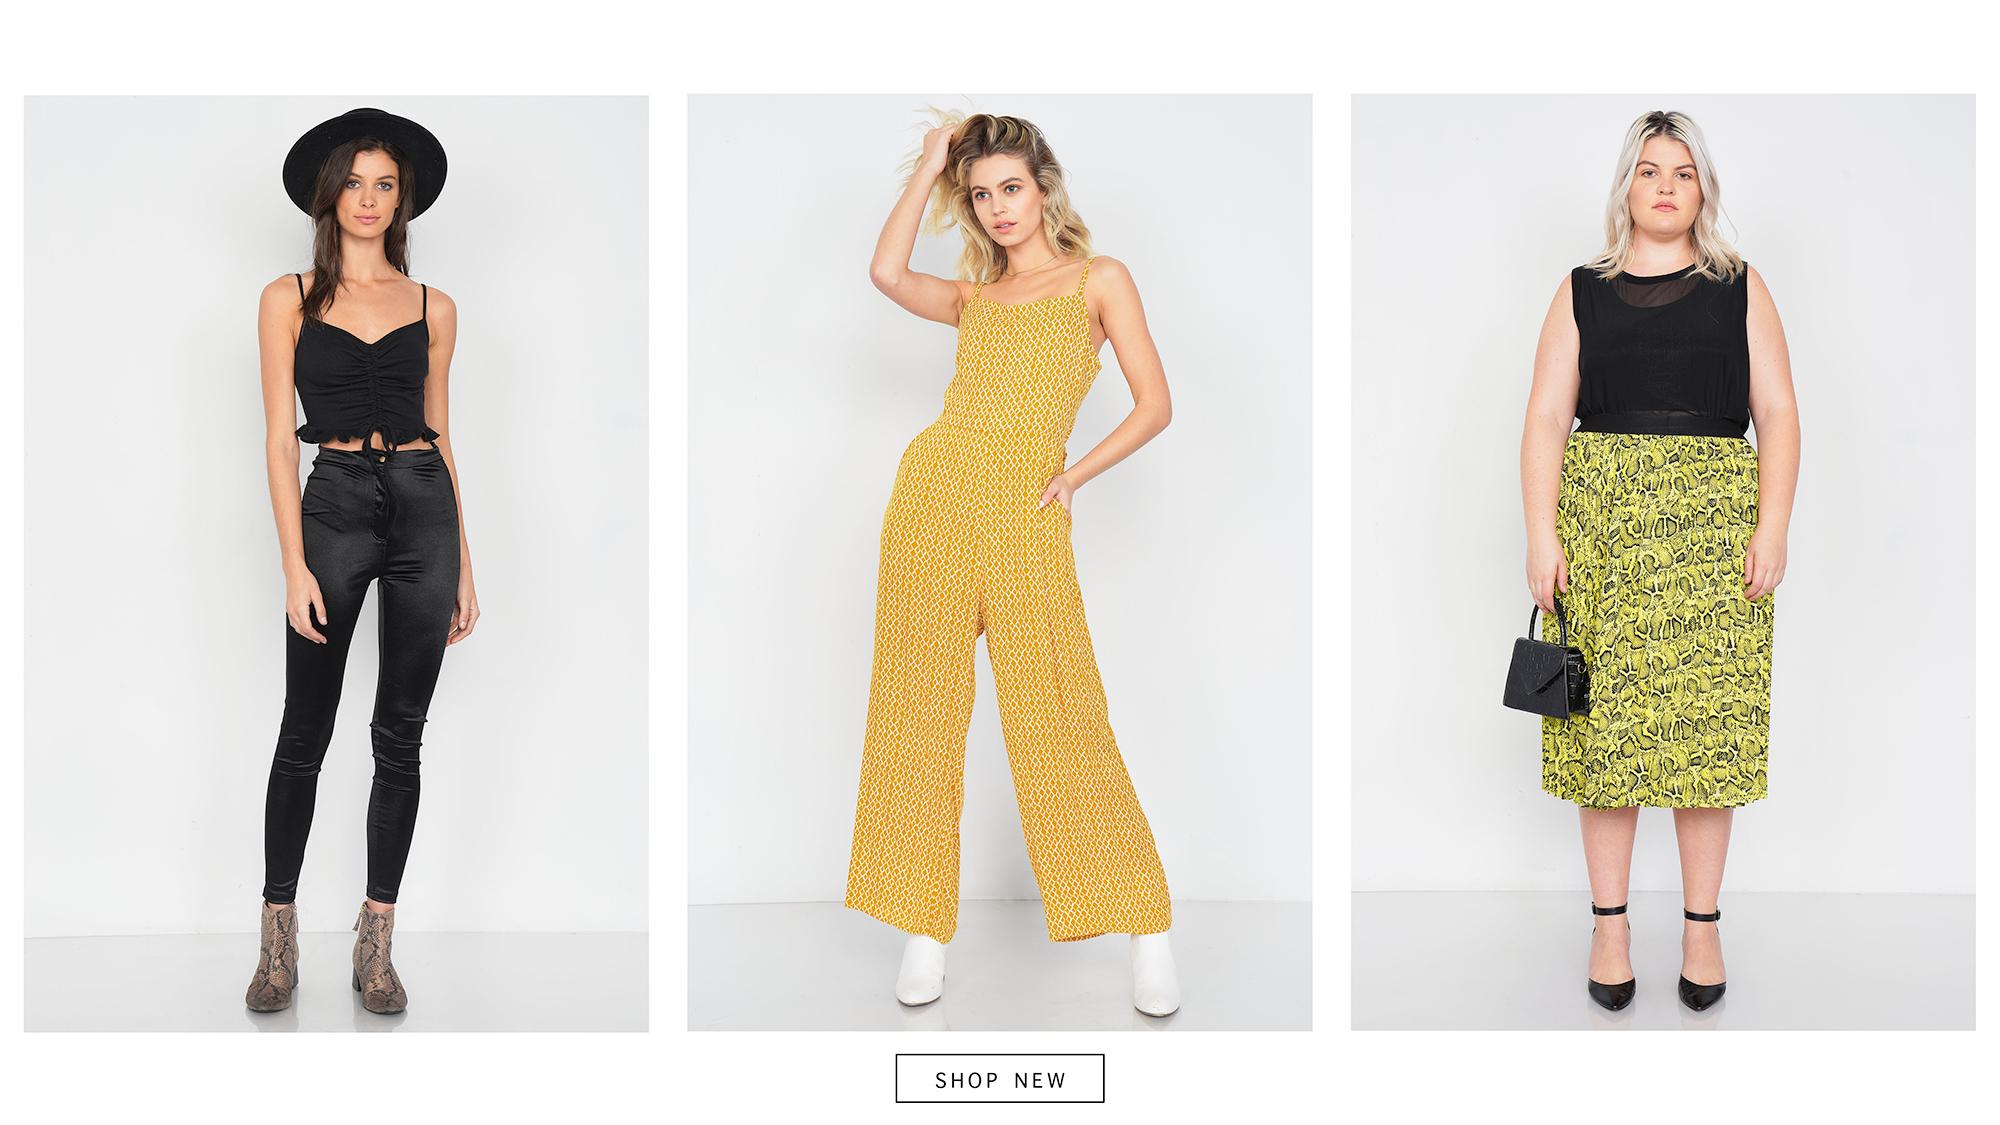 tasha apparel women apparel wholesale suppliers